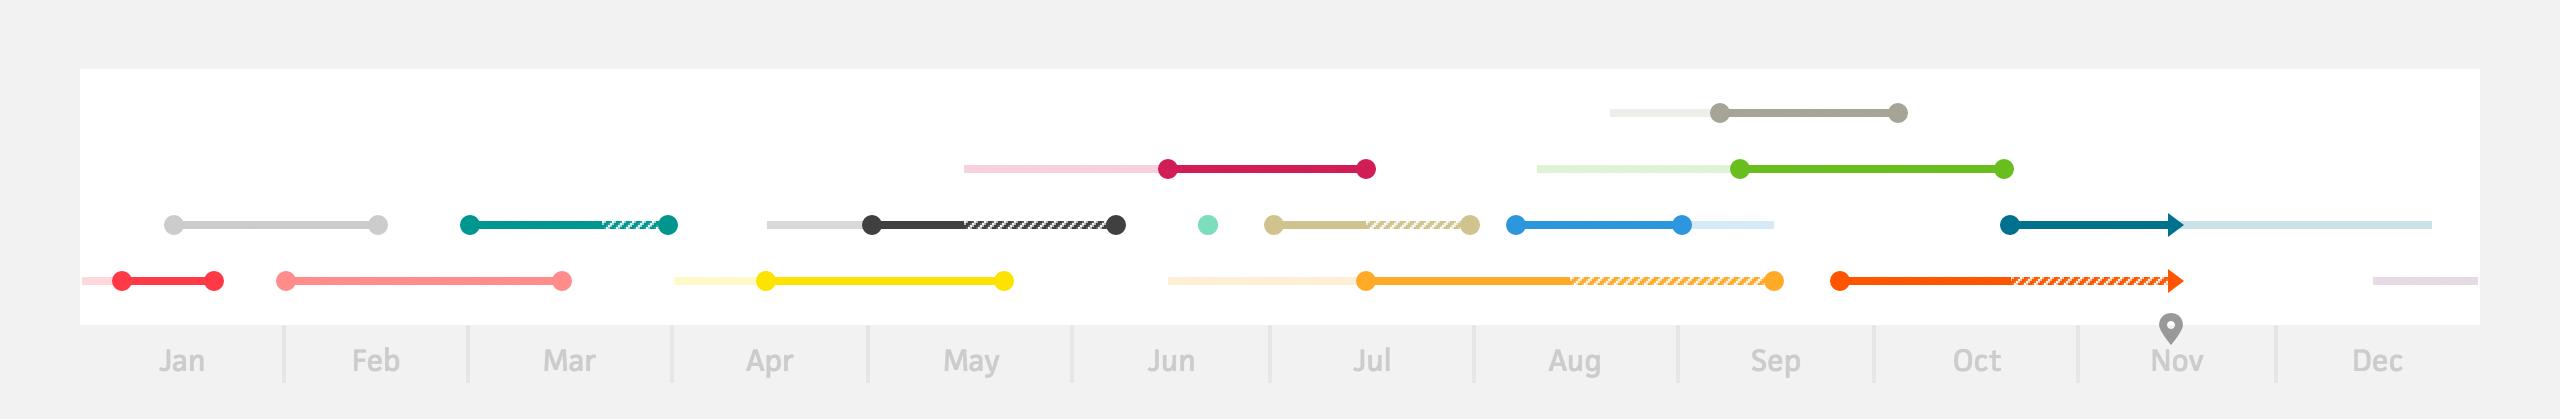 2015-01-06-graph